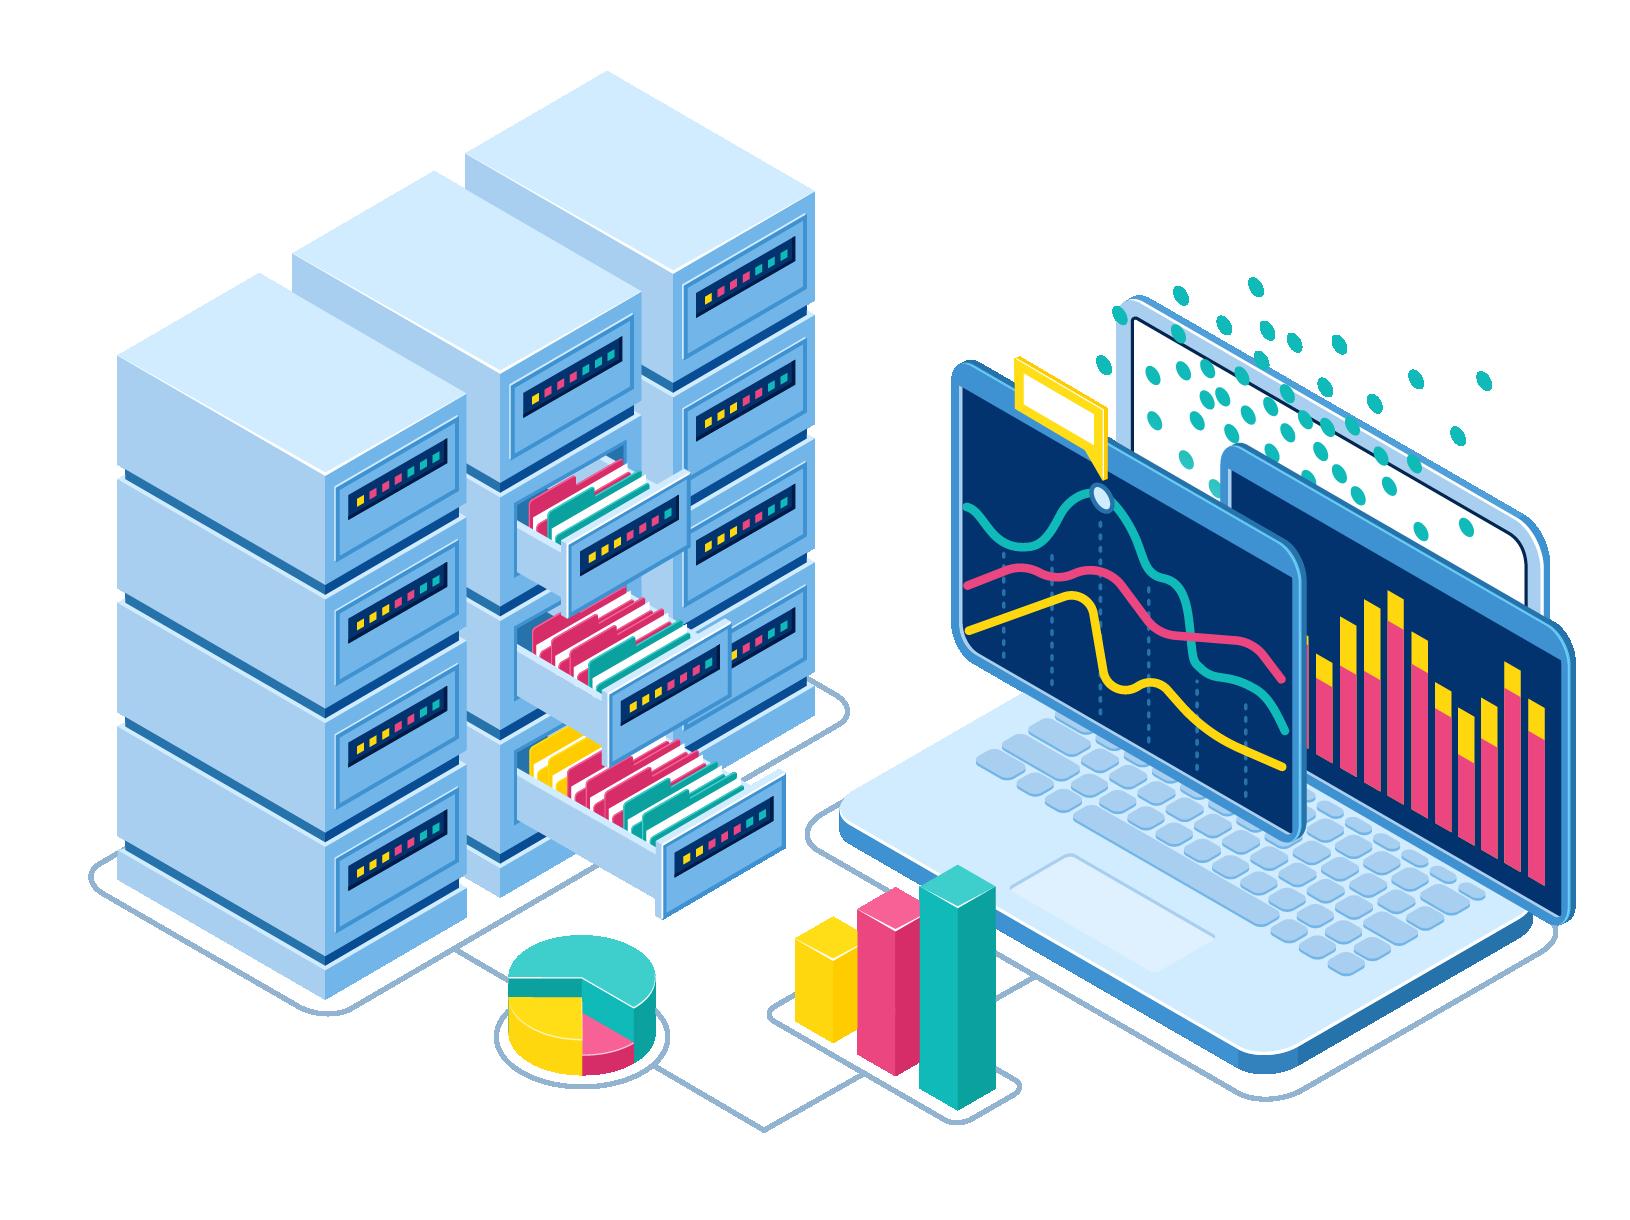 powerdata - gobierno de datos